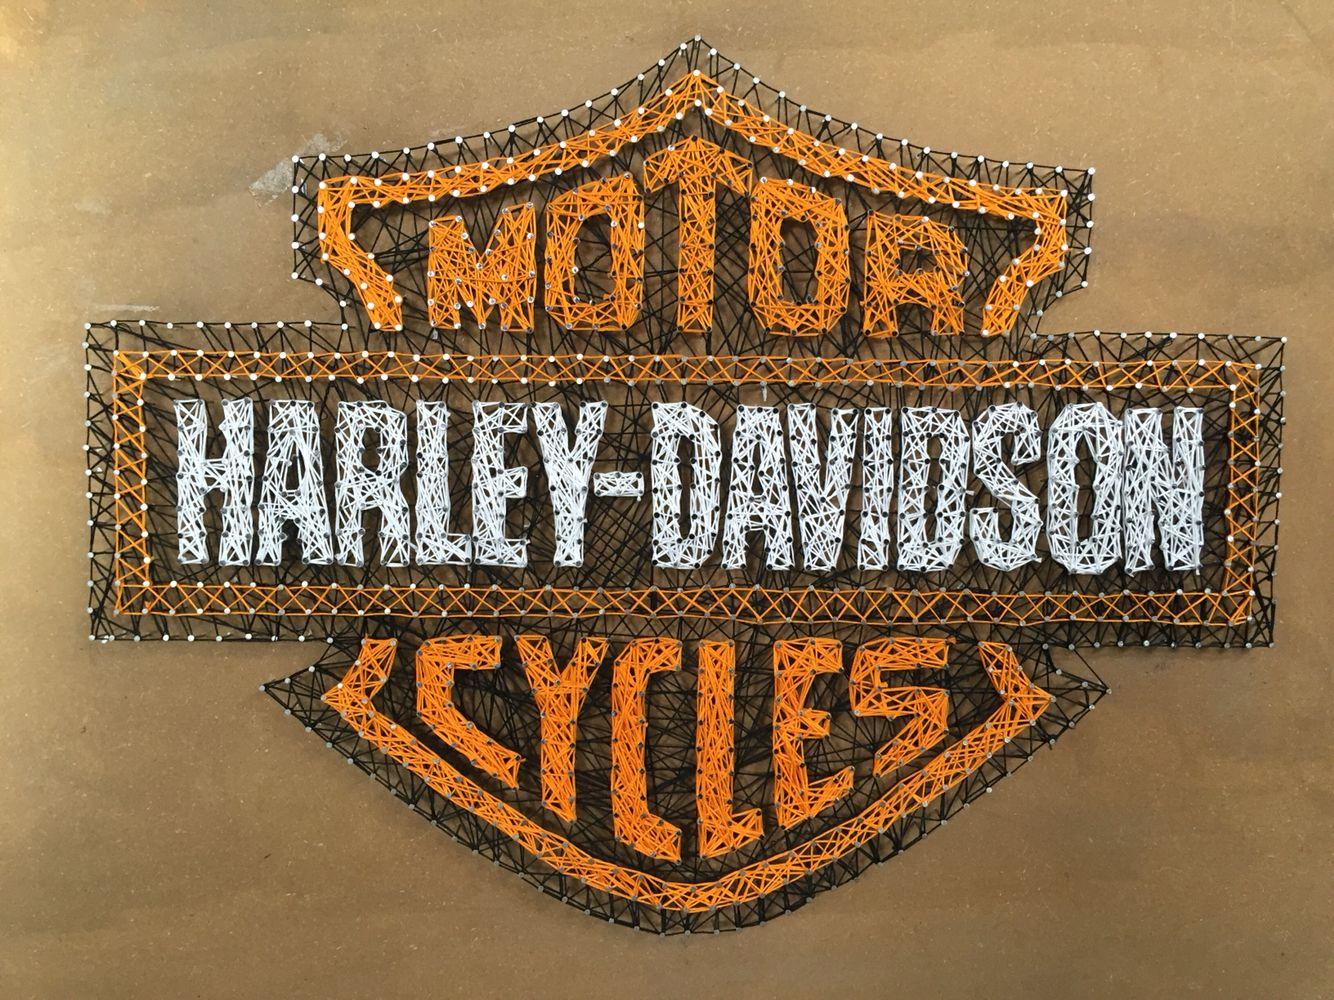 Made a Harley Davidson string art More